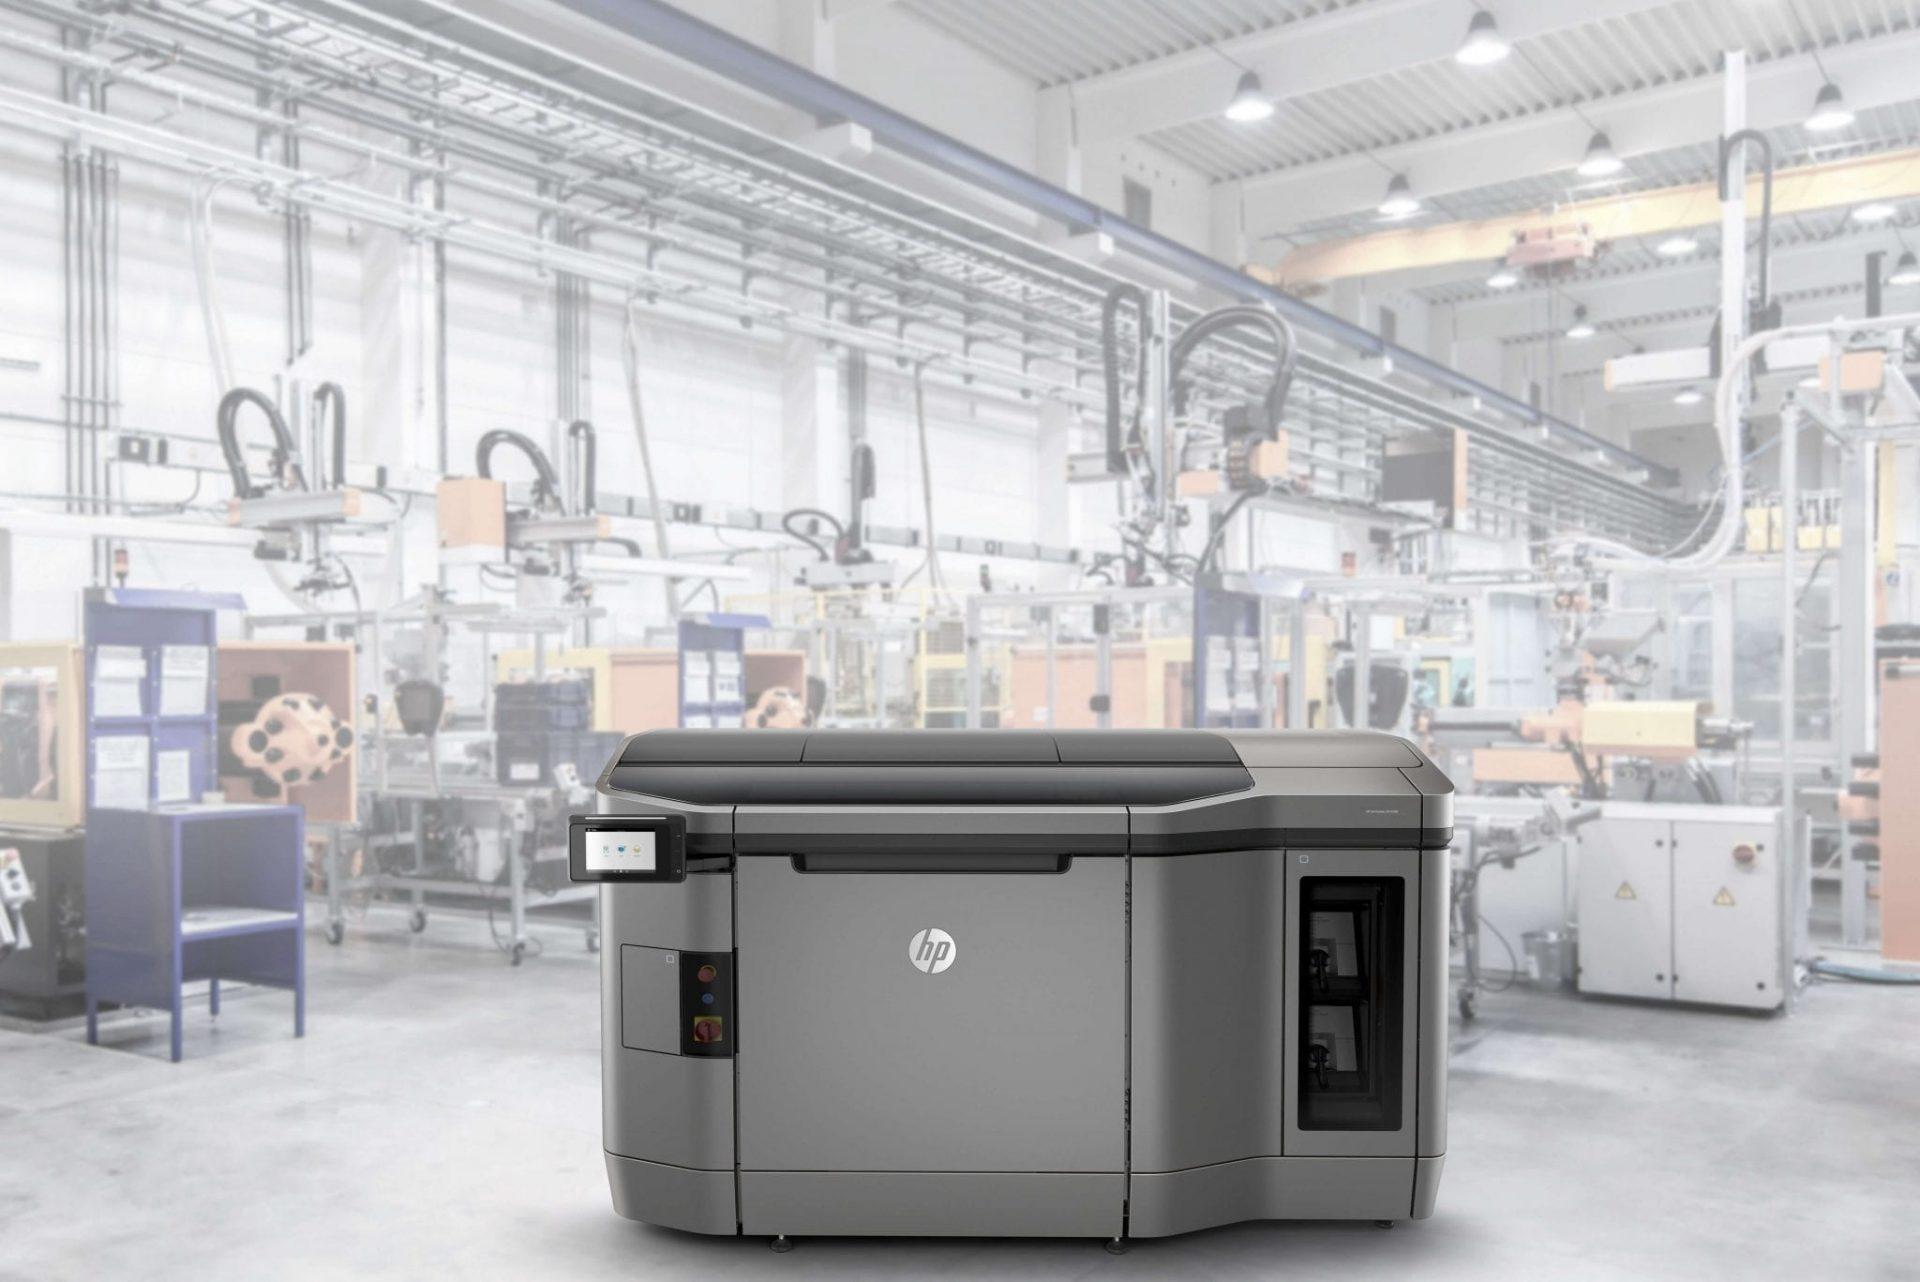 Hp jet fusion 4200 3d printer 2